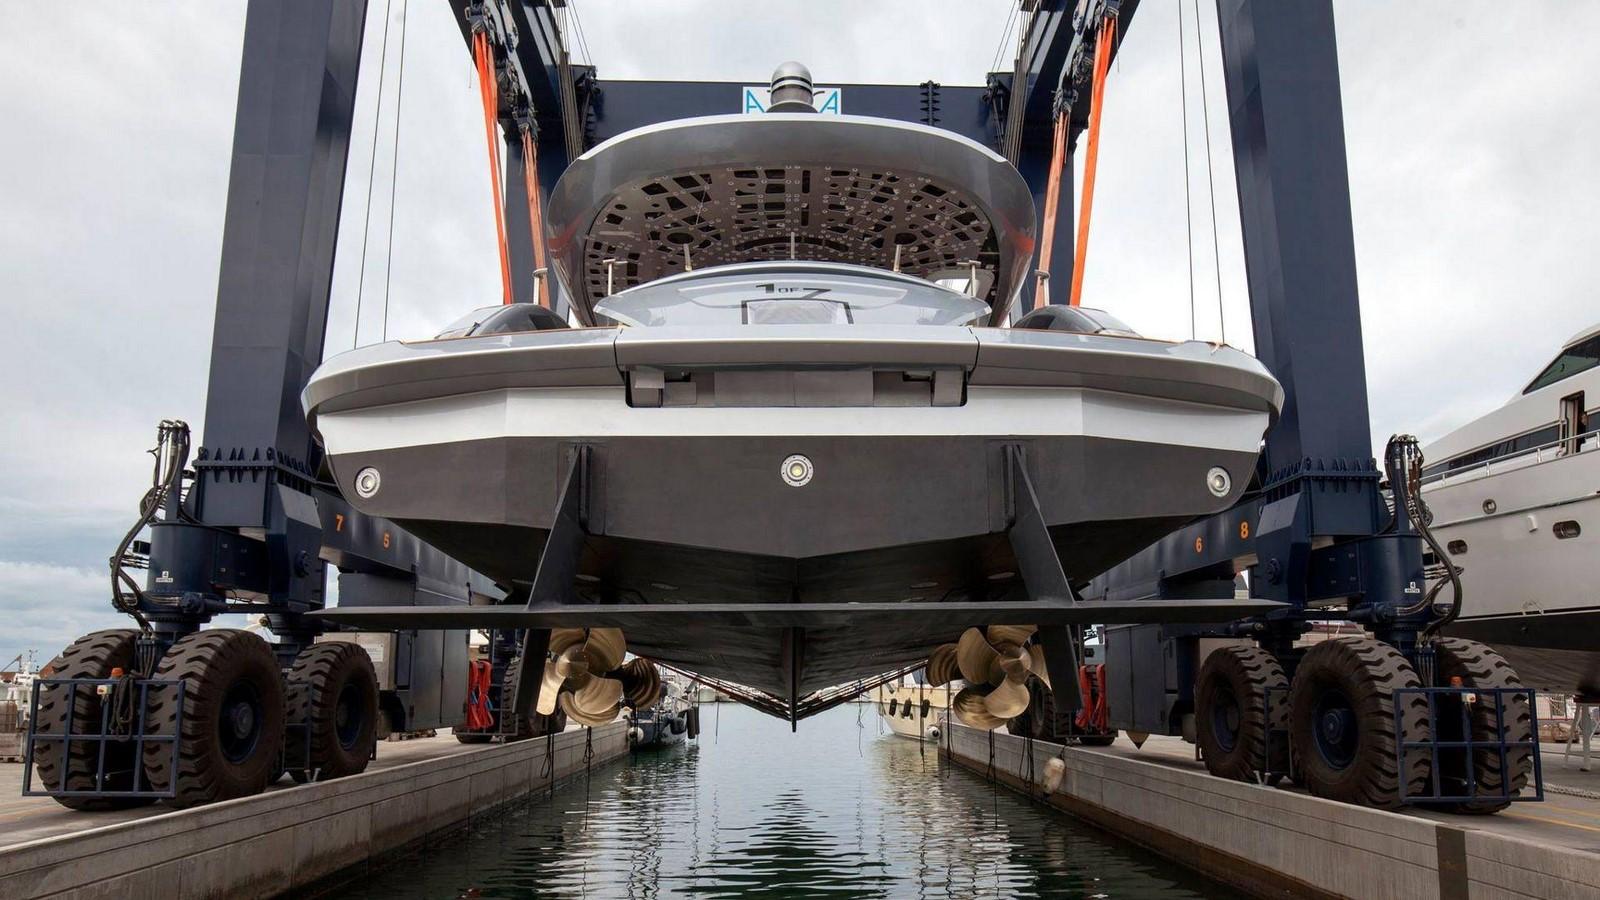 porsche-design-dynamiq-gtt-115-hybrid-superyacht (4)